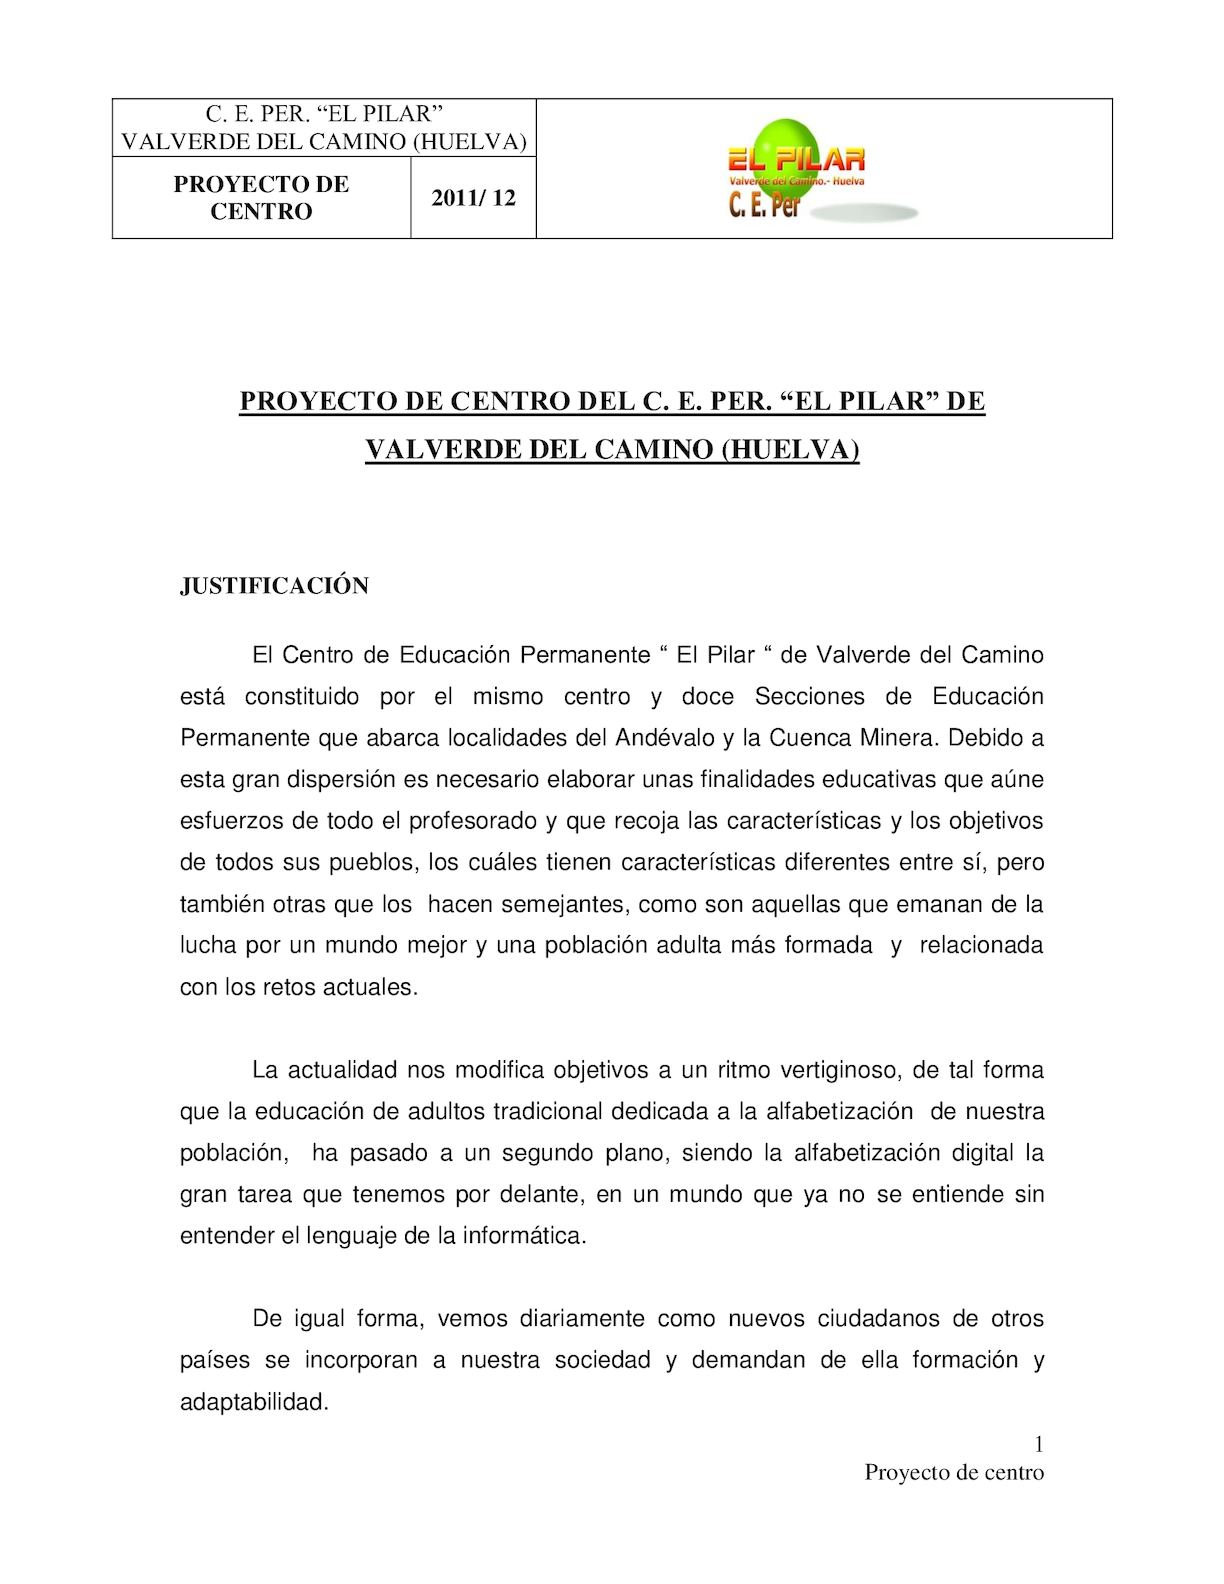 Citas en linea Managua carcel